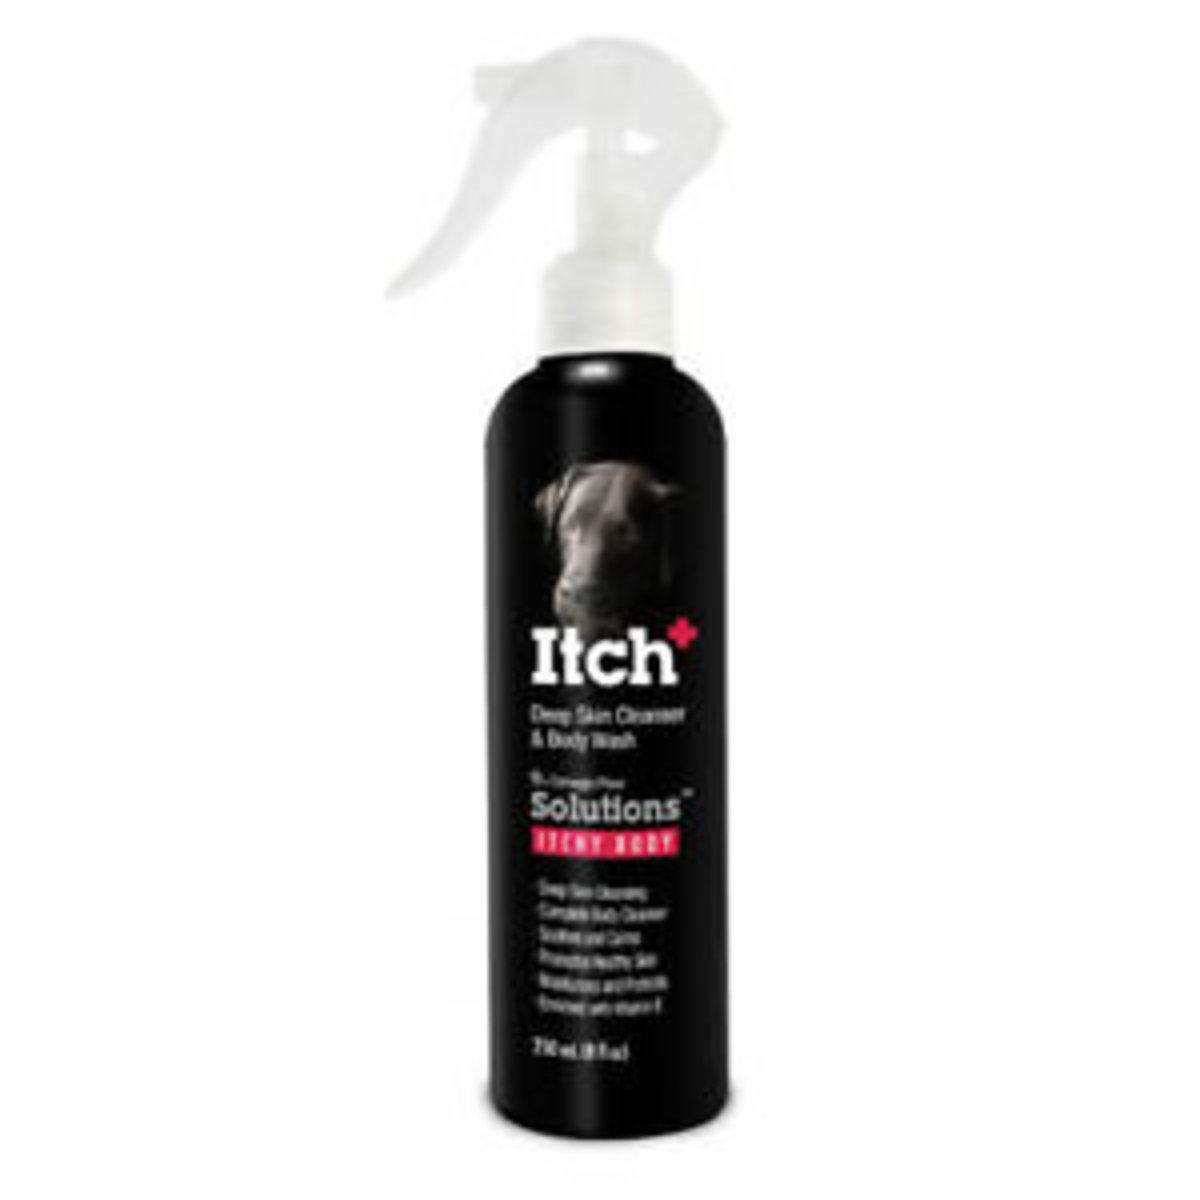 Omega Itch+ Ithcy Body 8oz